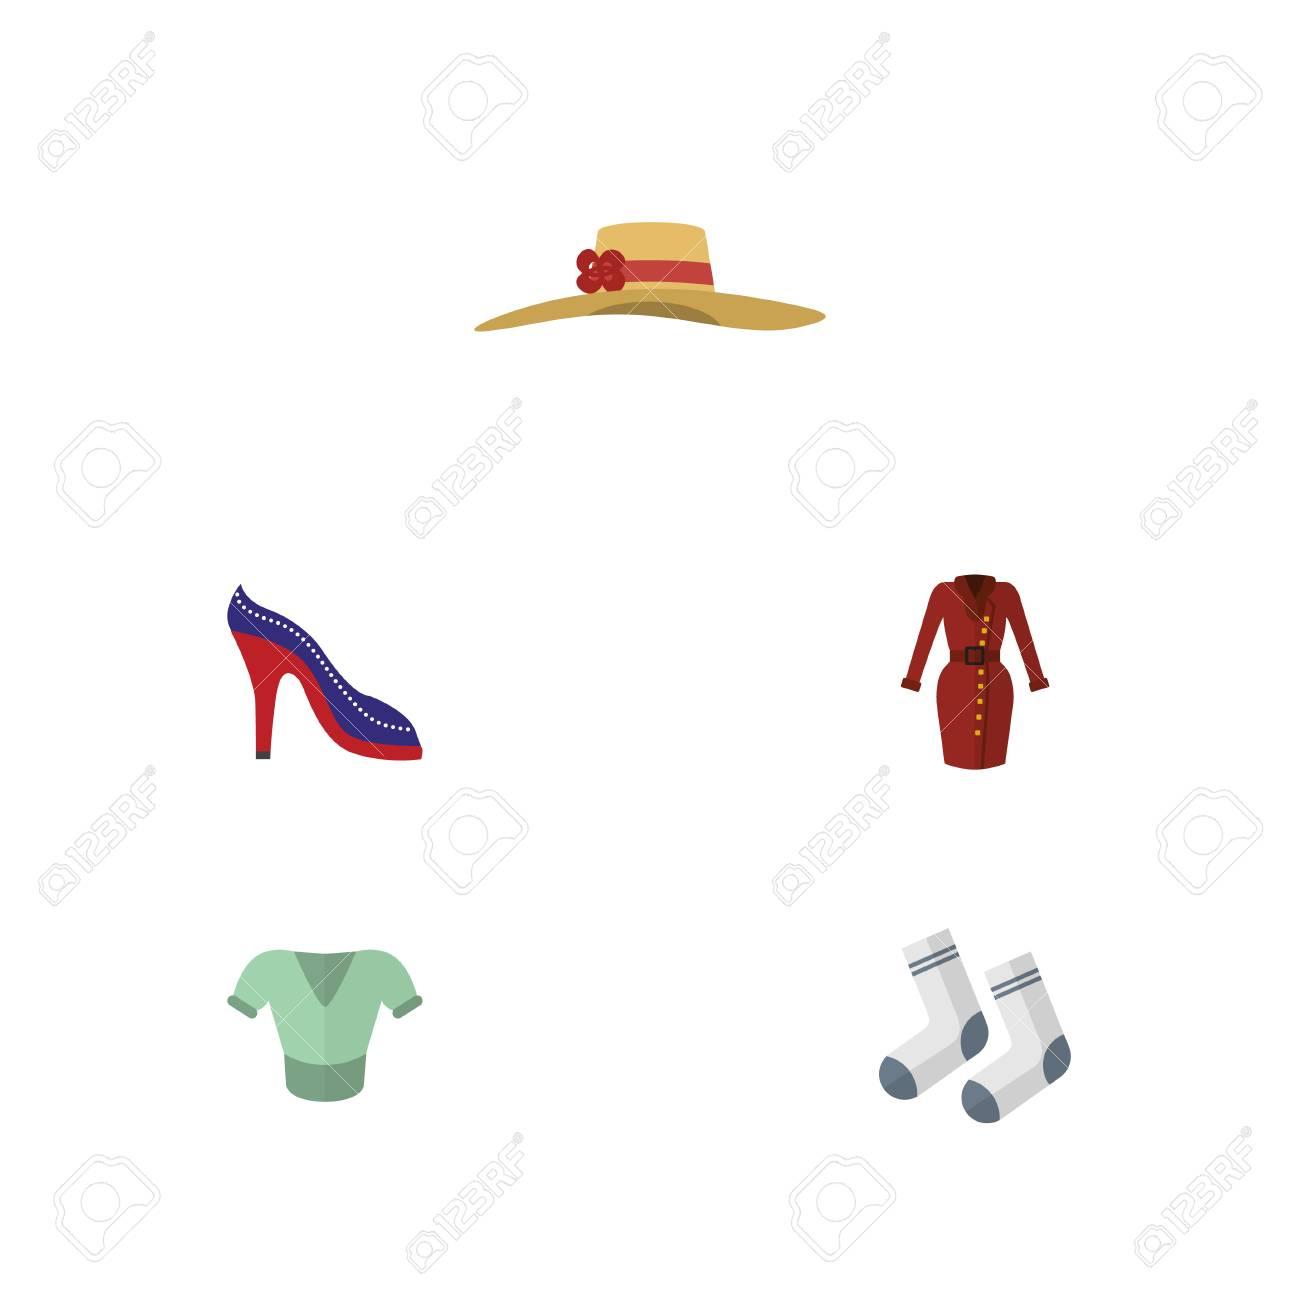 2e8d907e479 Foto de archivo - Vestido de icono plano conjunto de zapatos casuales